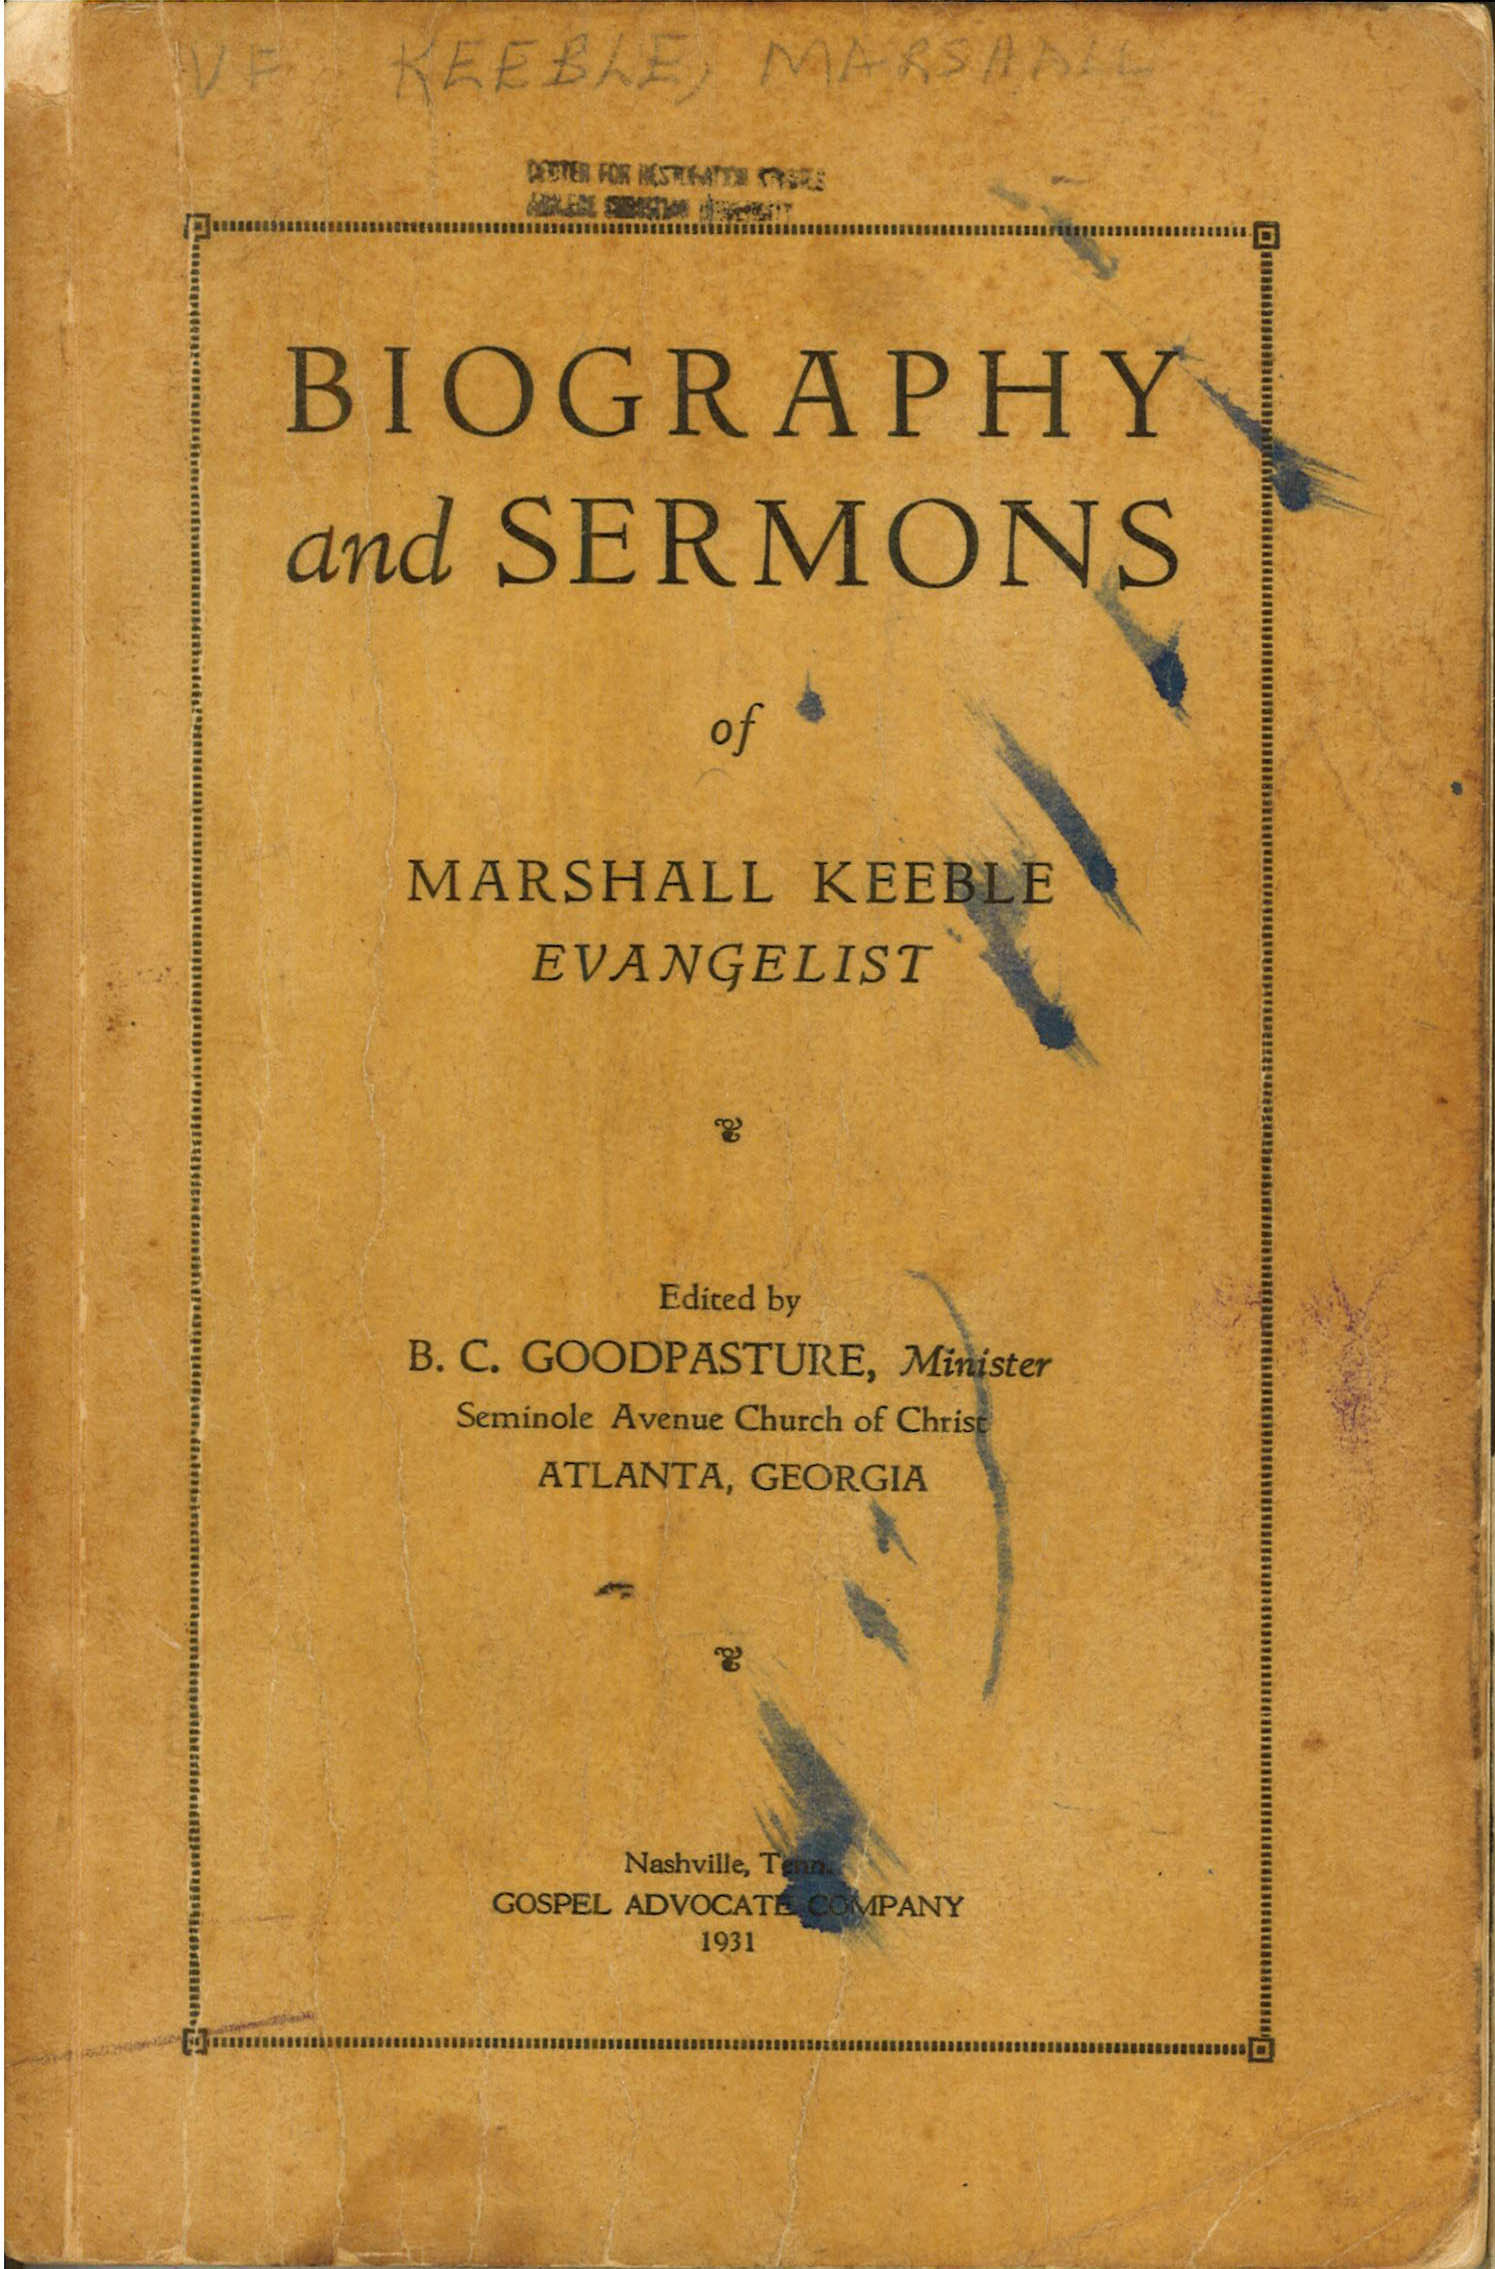 Biography And Sermons Of Marshall Keeble Evangelist Nashville Gospel Advocate Company 1931